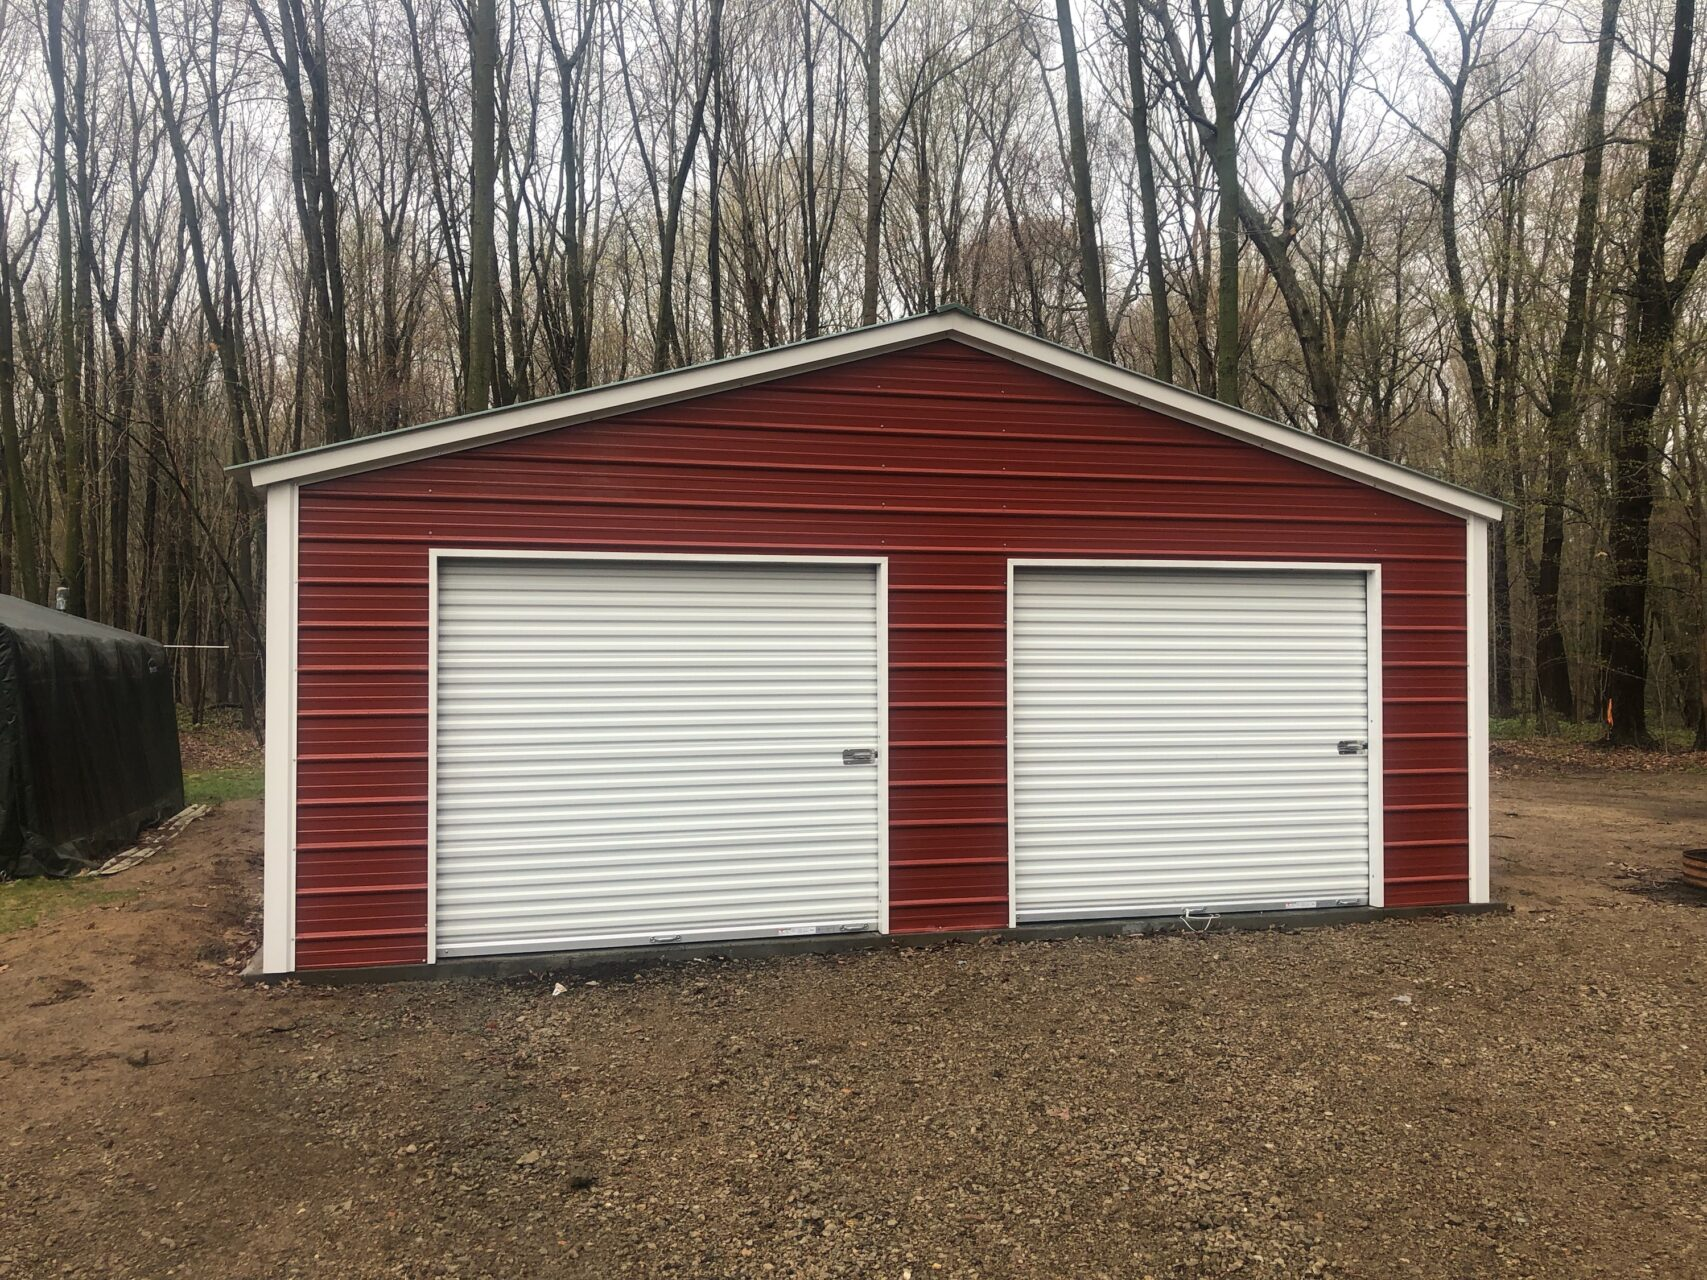 24x36x8 Steel Garage in Flint, Michigan